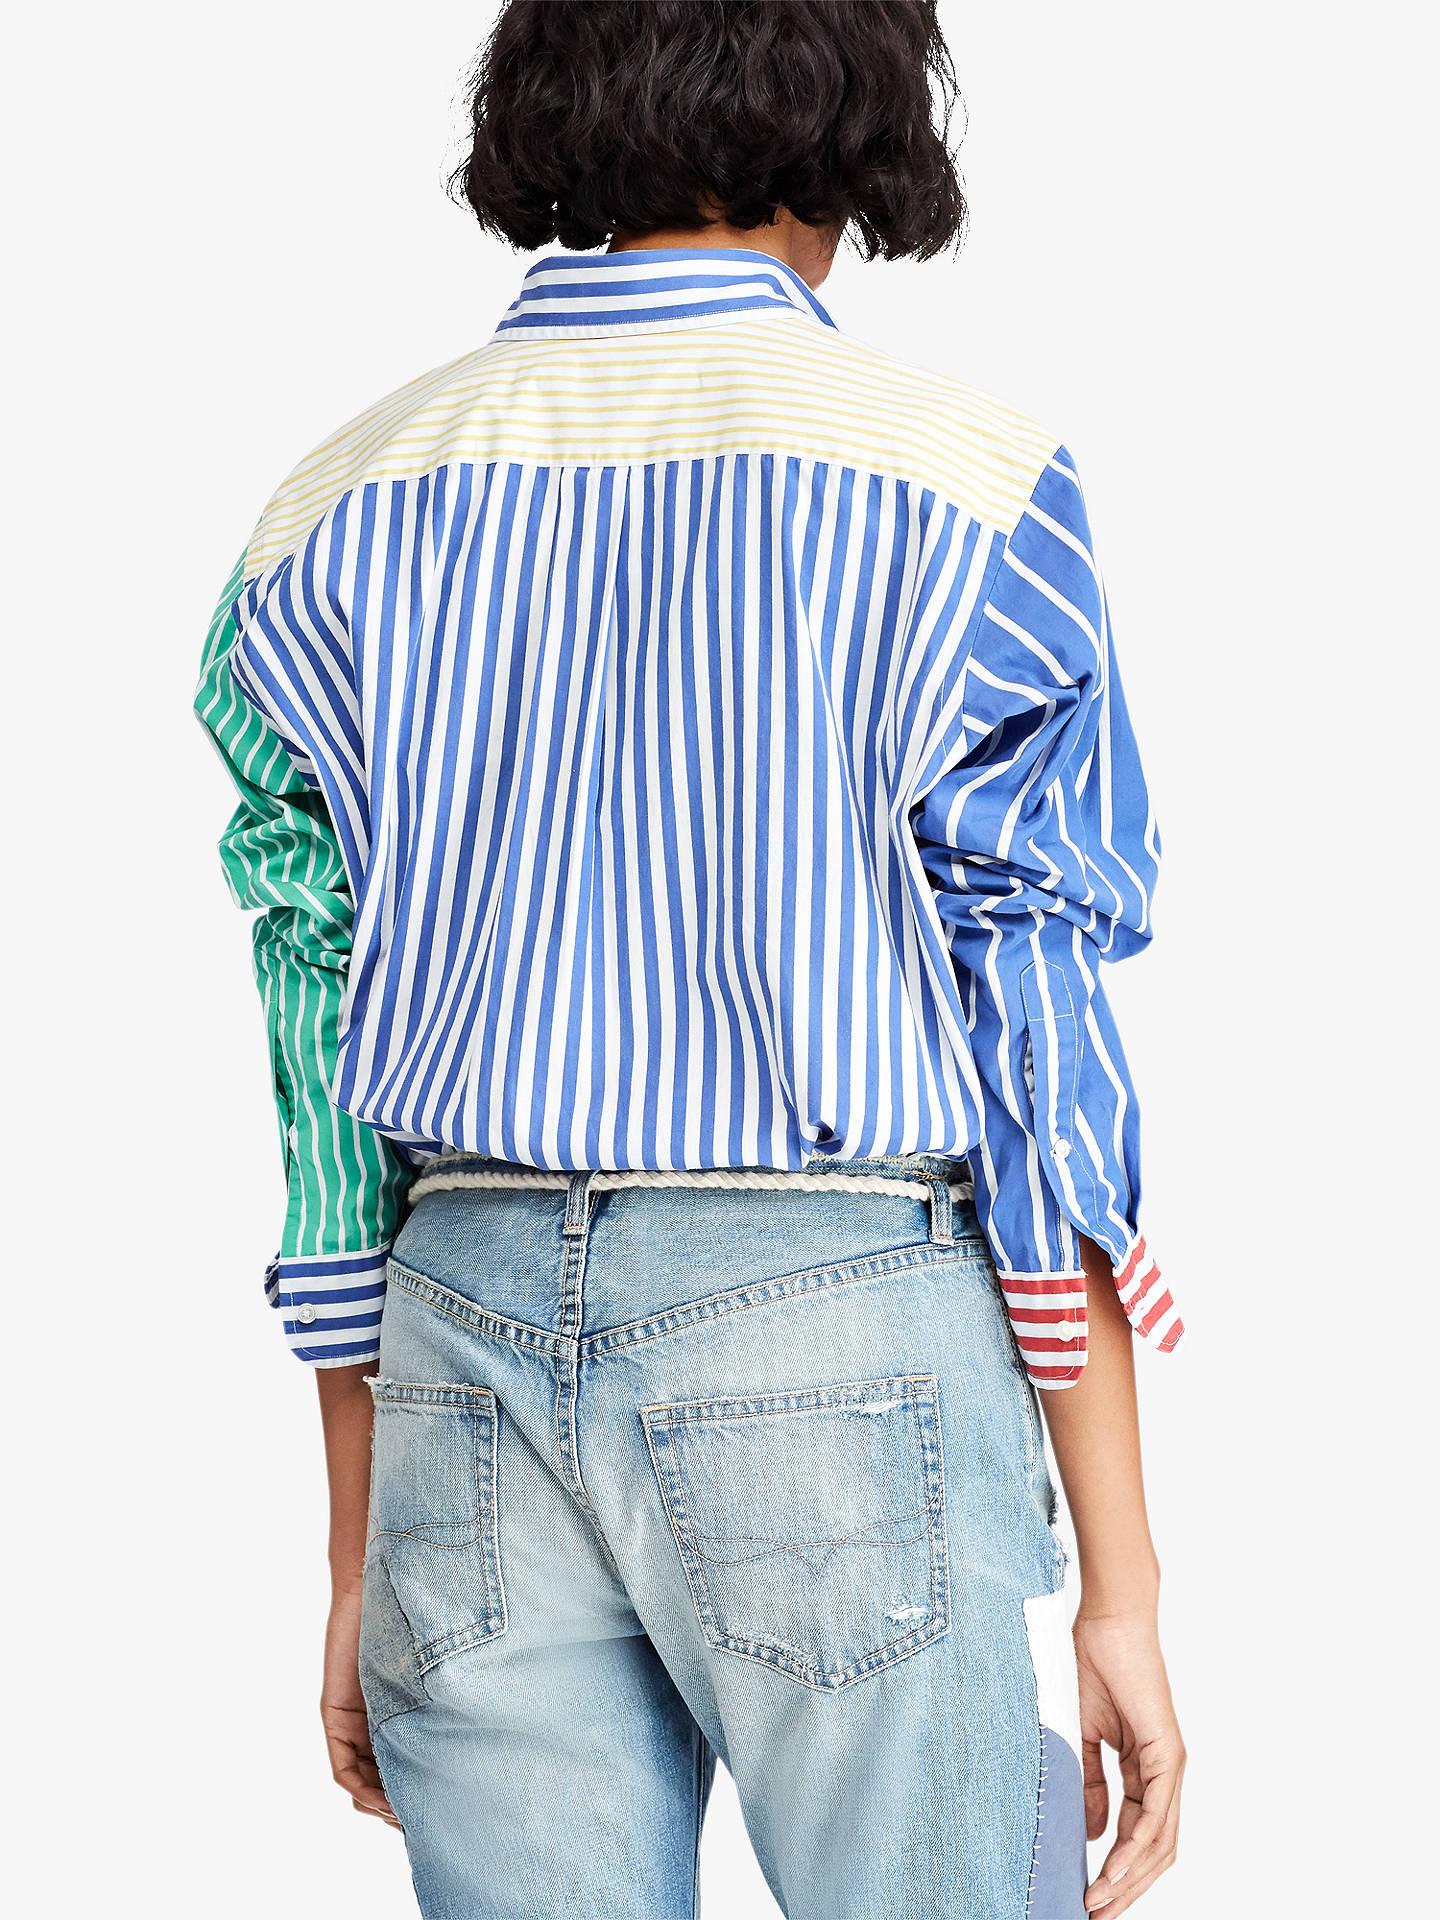 Stripe ShirtAt Polo Lauren Long Sleeve Ralph Multi John WDeH9E2IY